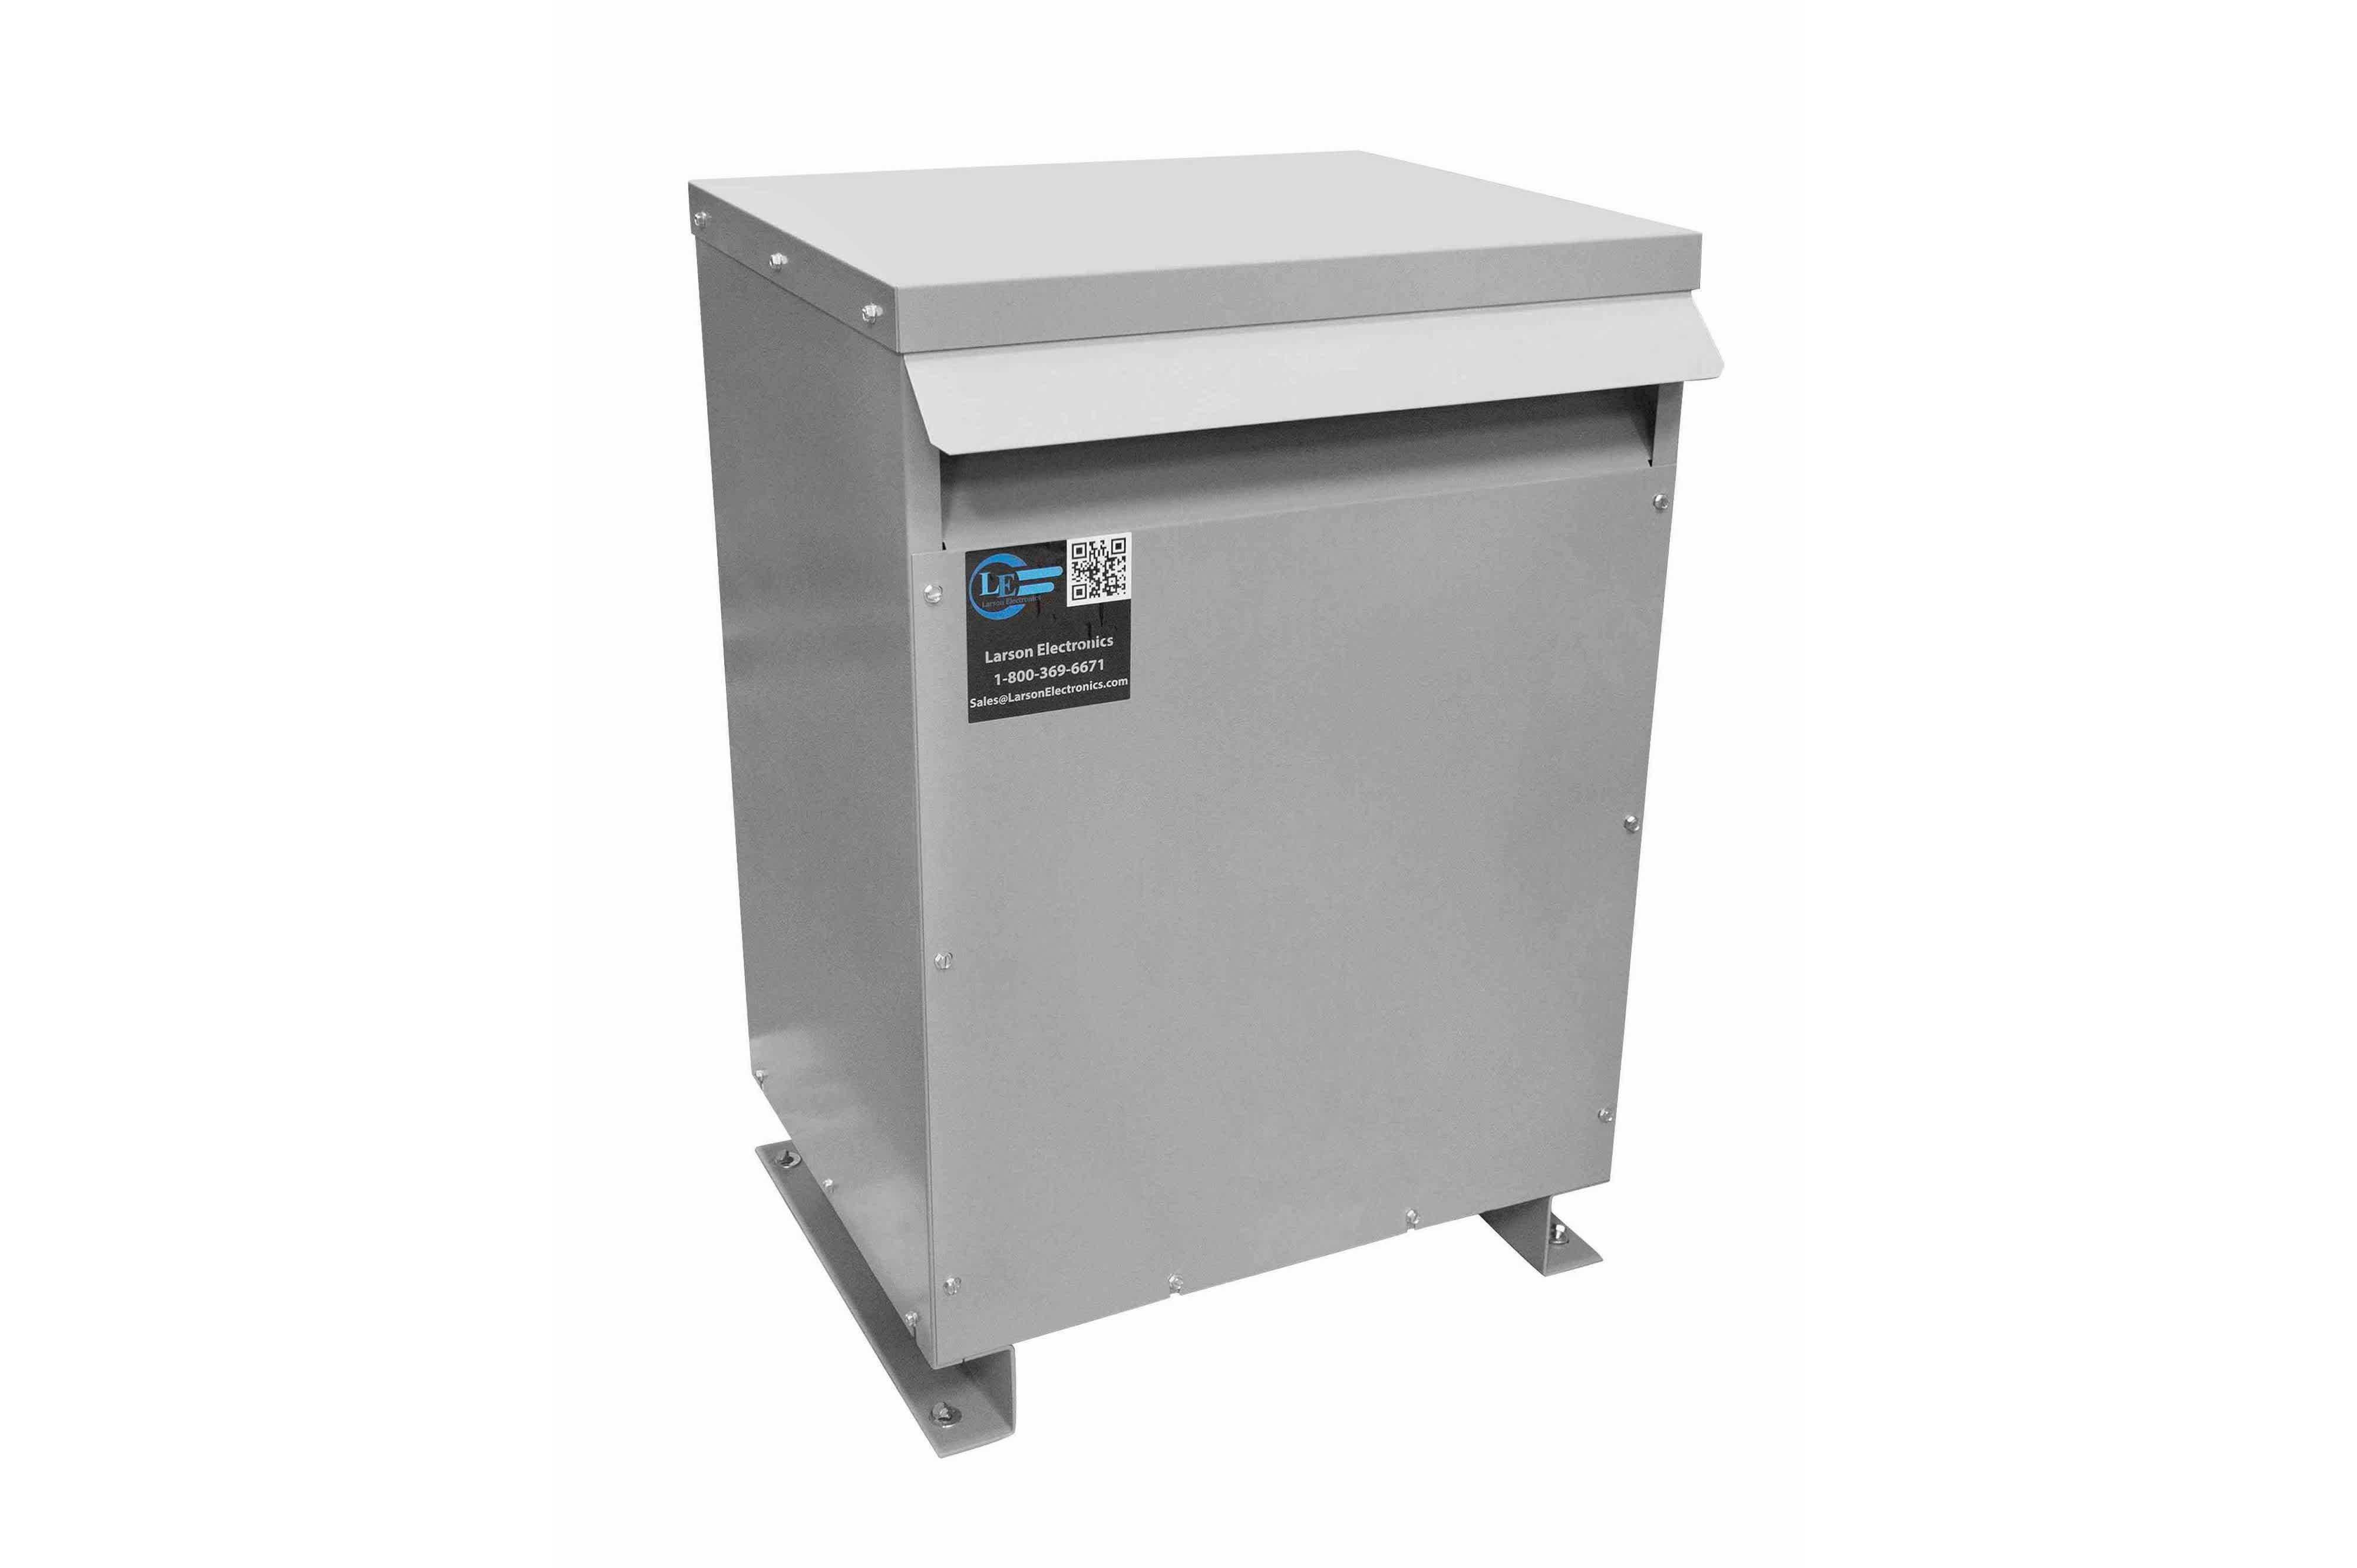 52.5 kVA 3PH Isolation Transformer, 240V Wye Primary, 415V Delta Secondary, N3R, Ventilated, 60 Hz